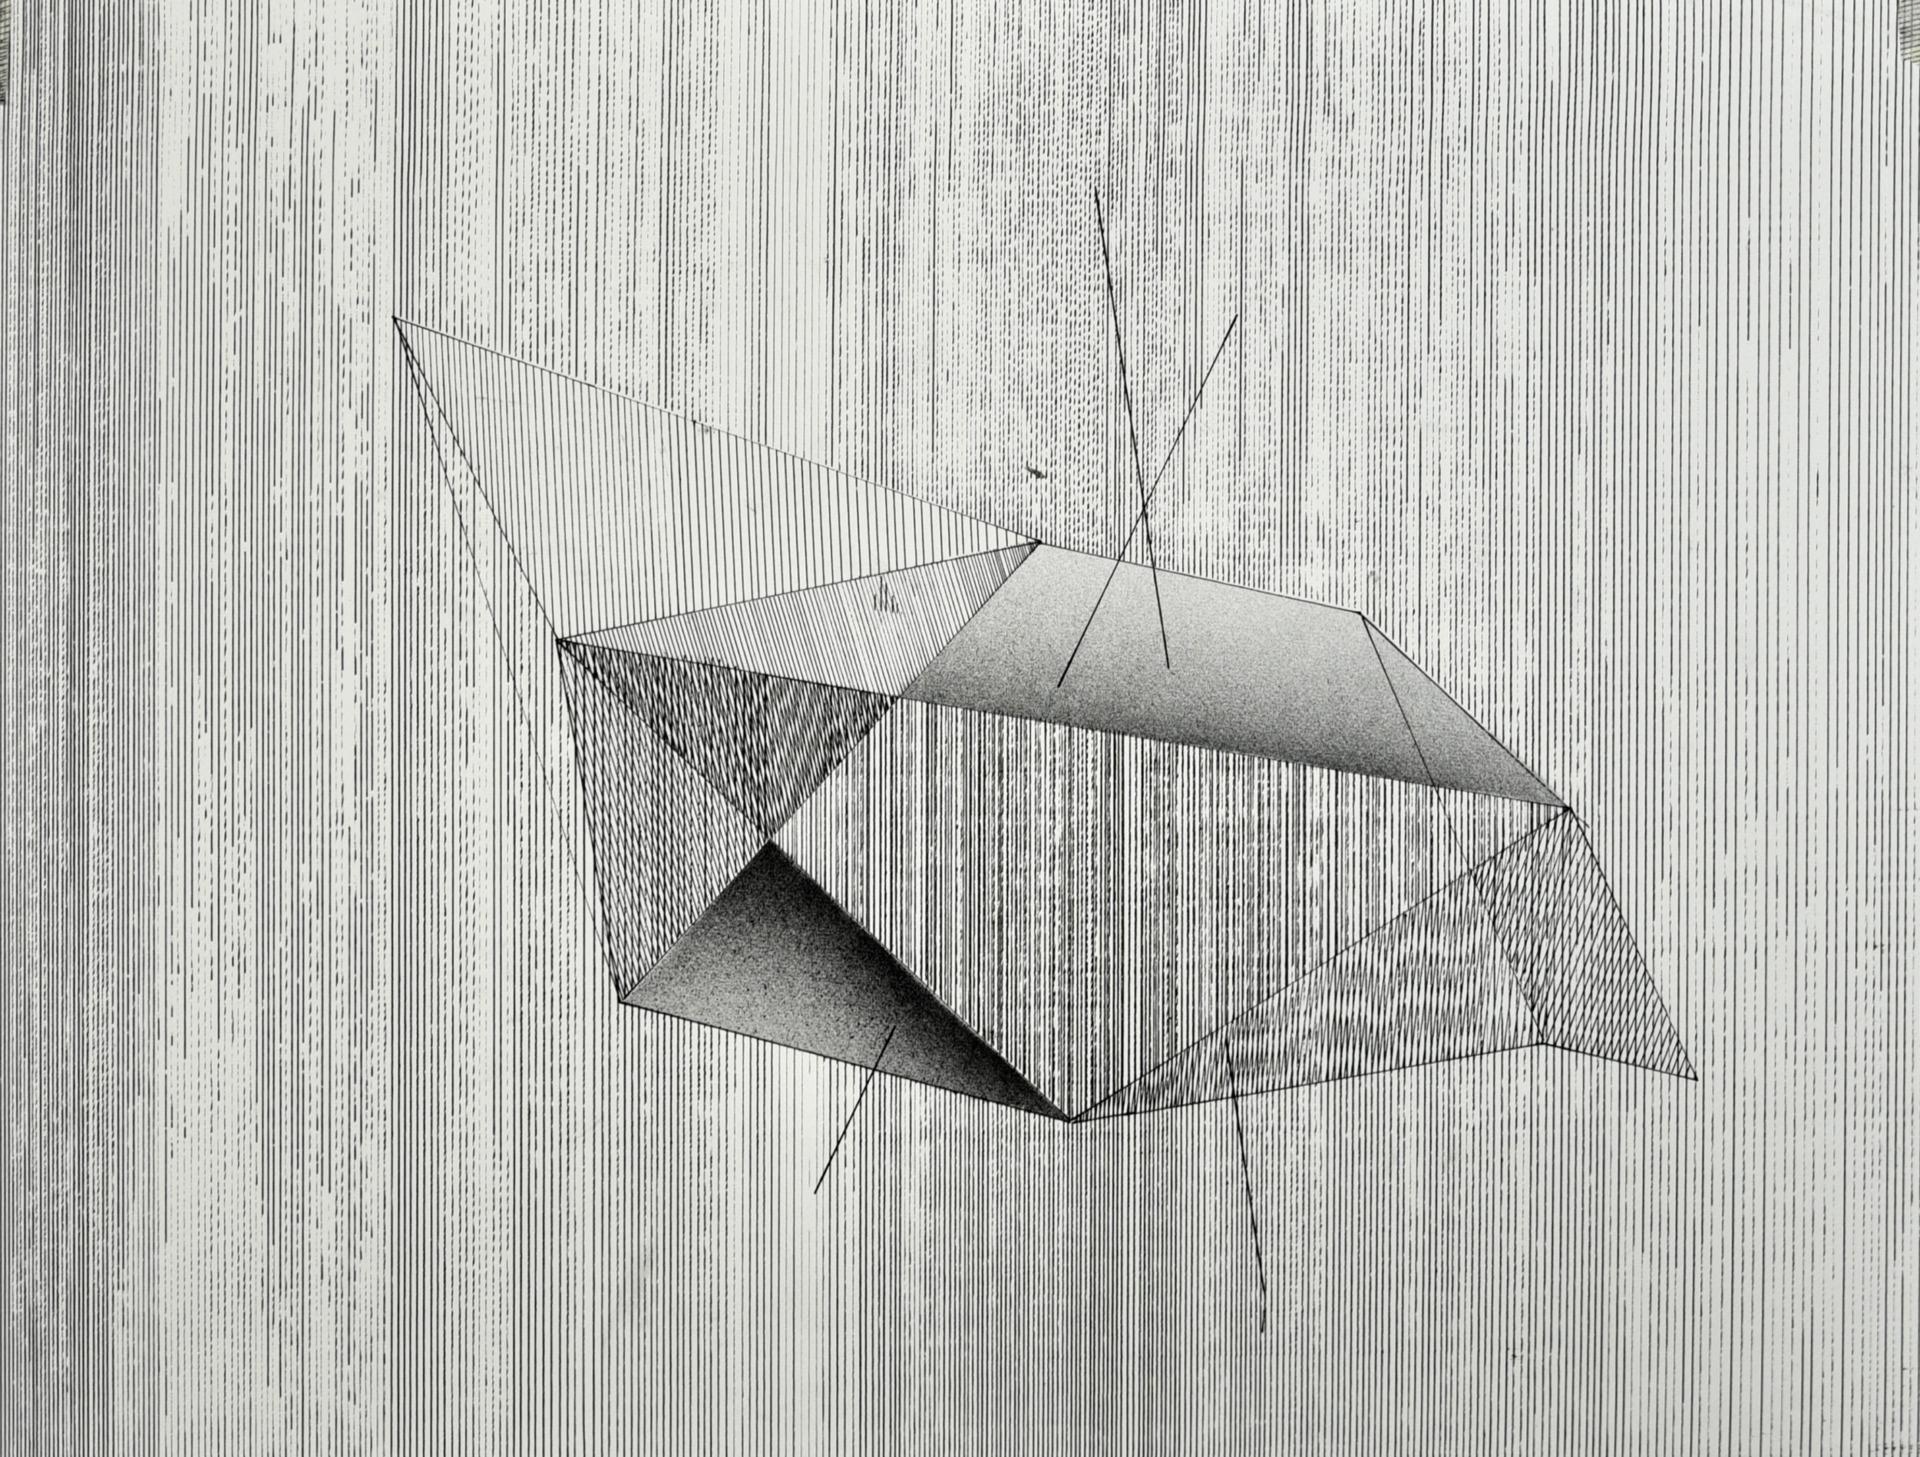 Contemporary art from Gyula Sági | Op.181220. 3